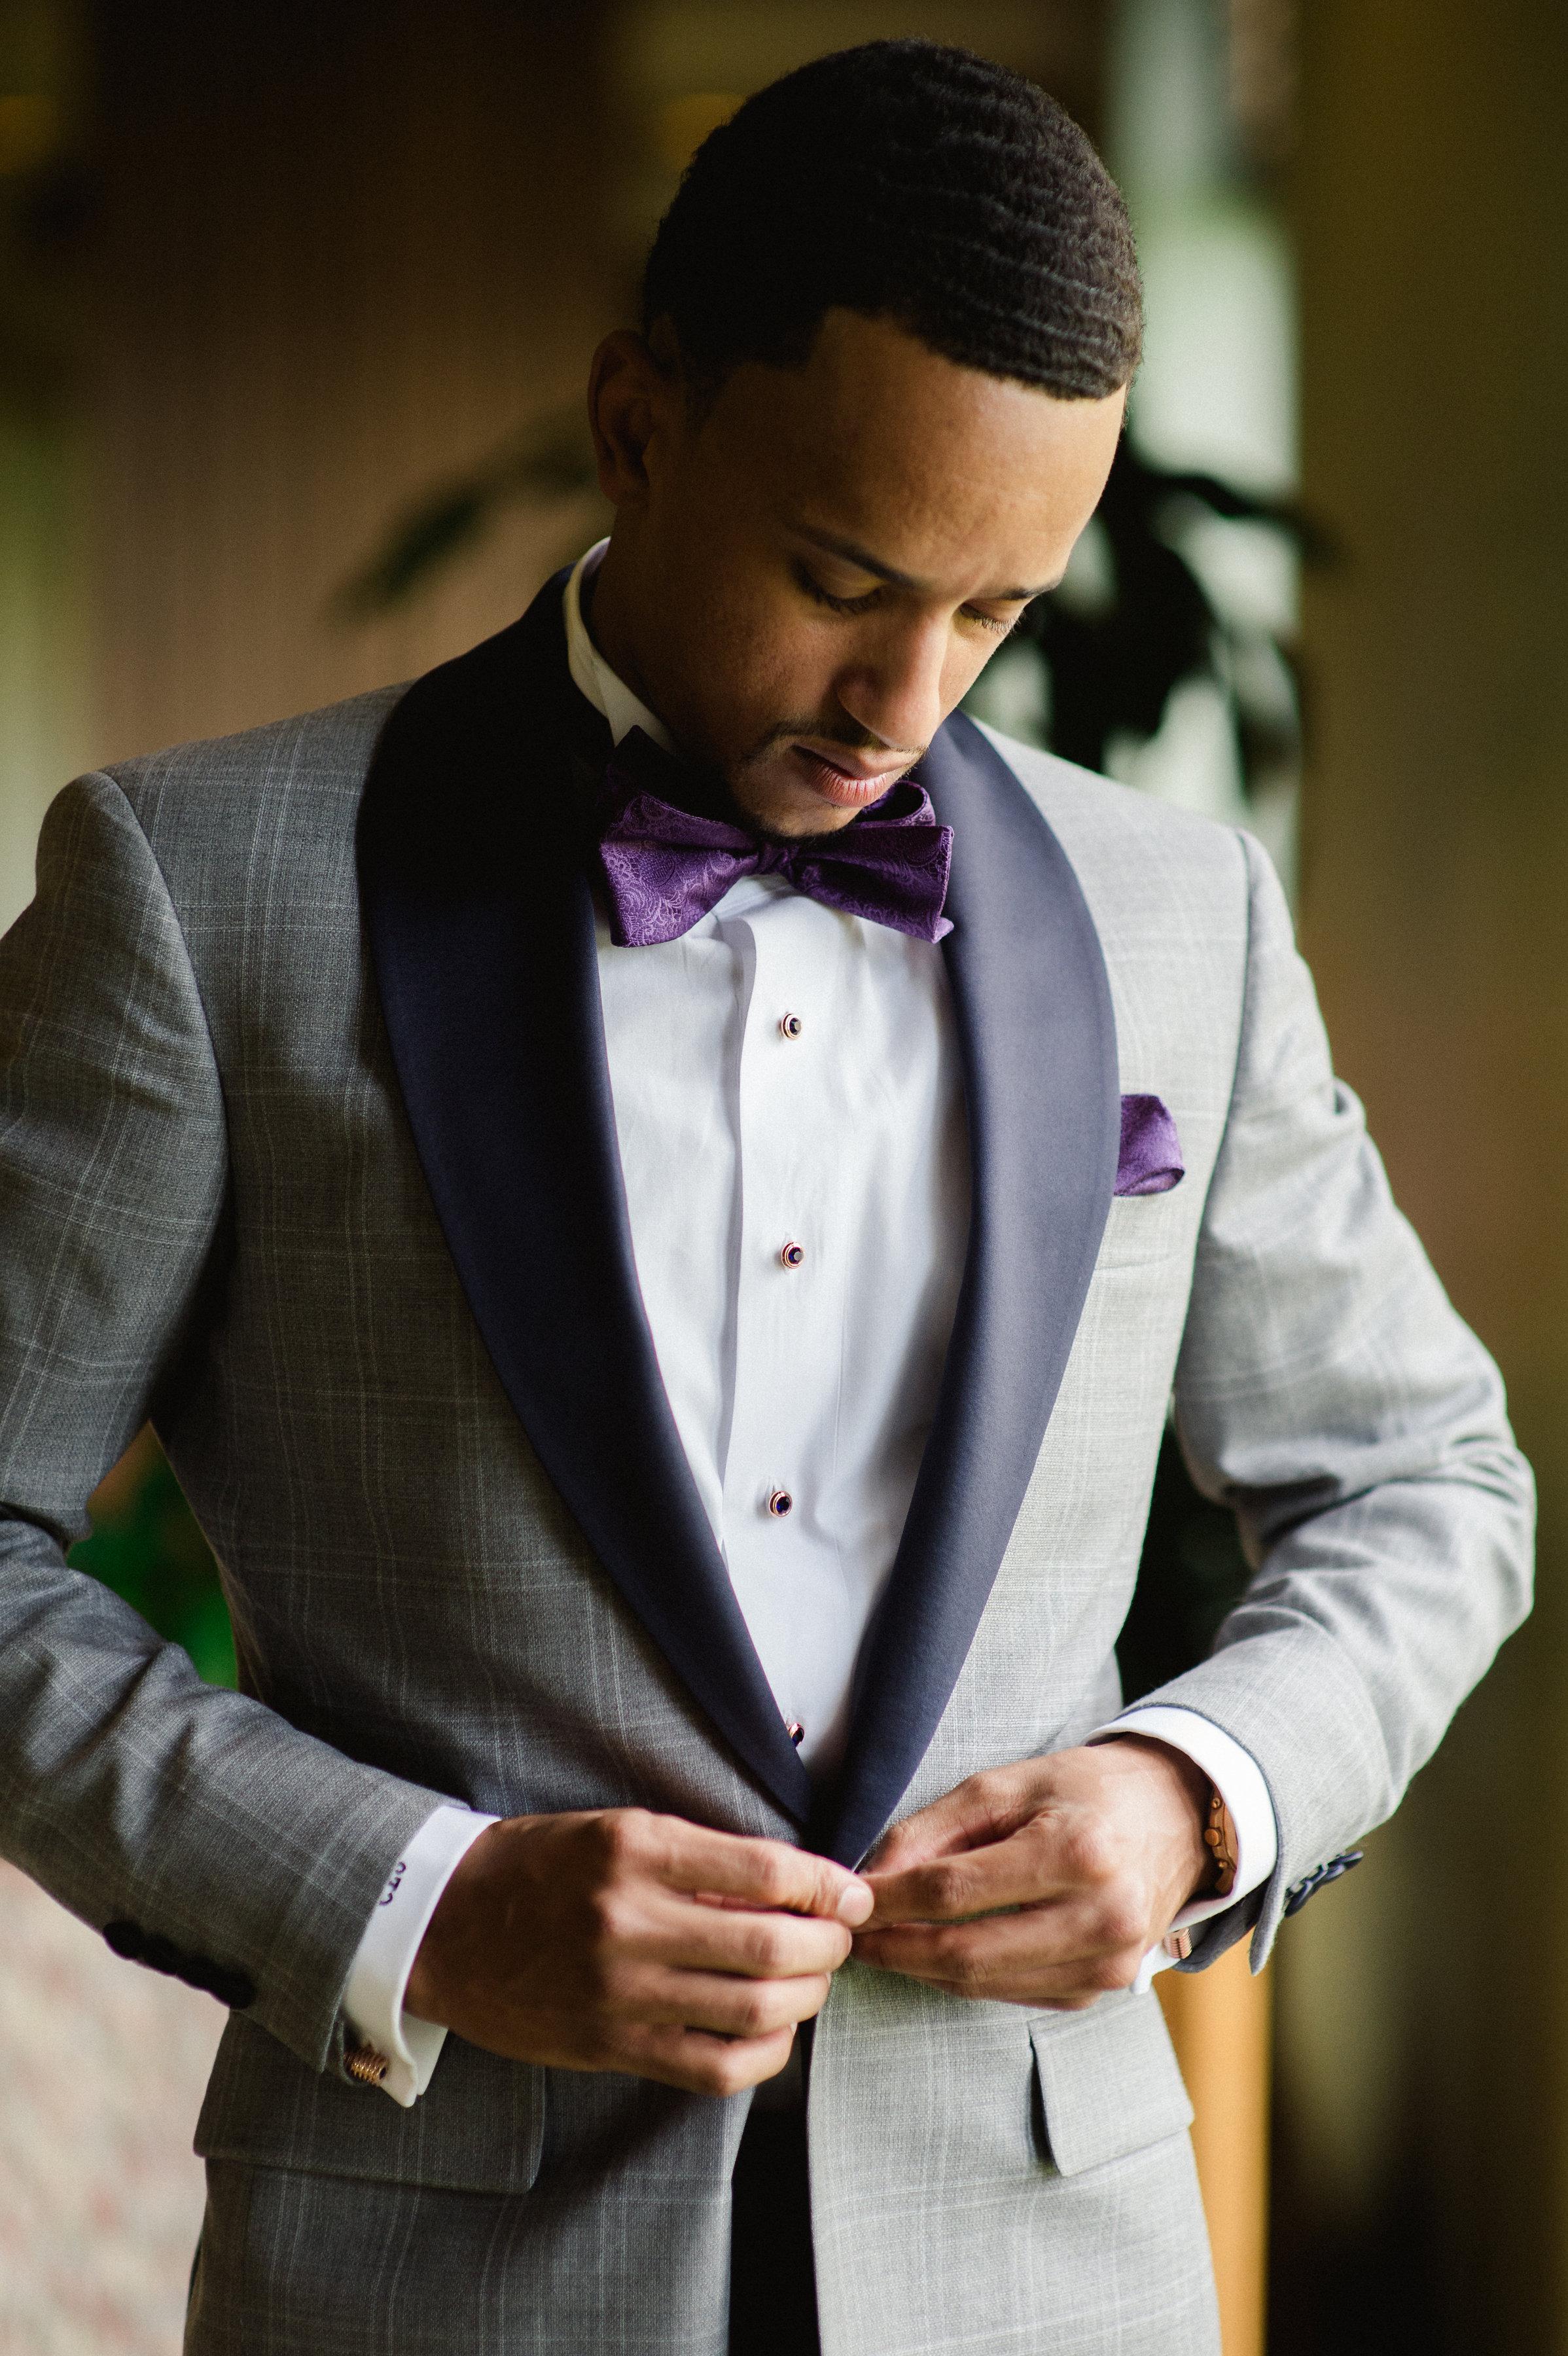 imani&chris|wedding|groups-70.jpg